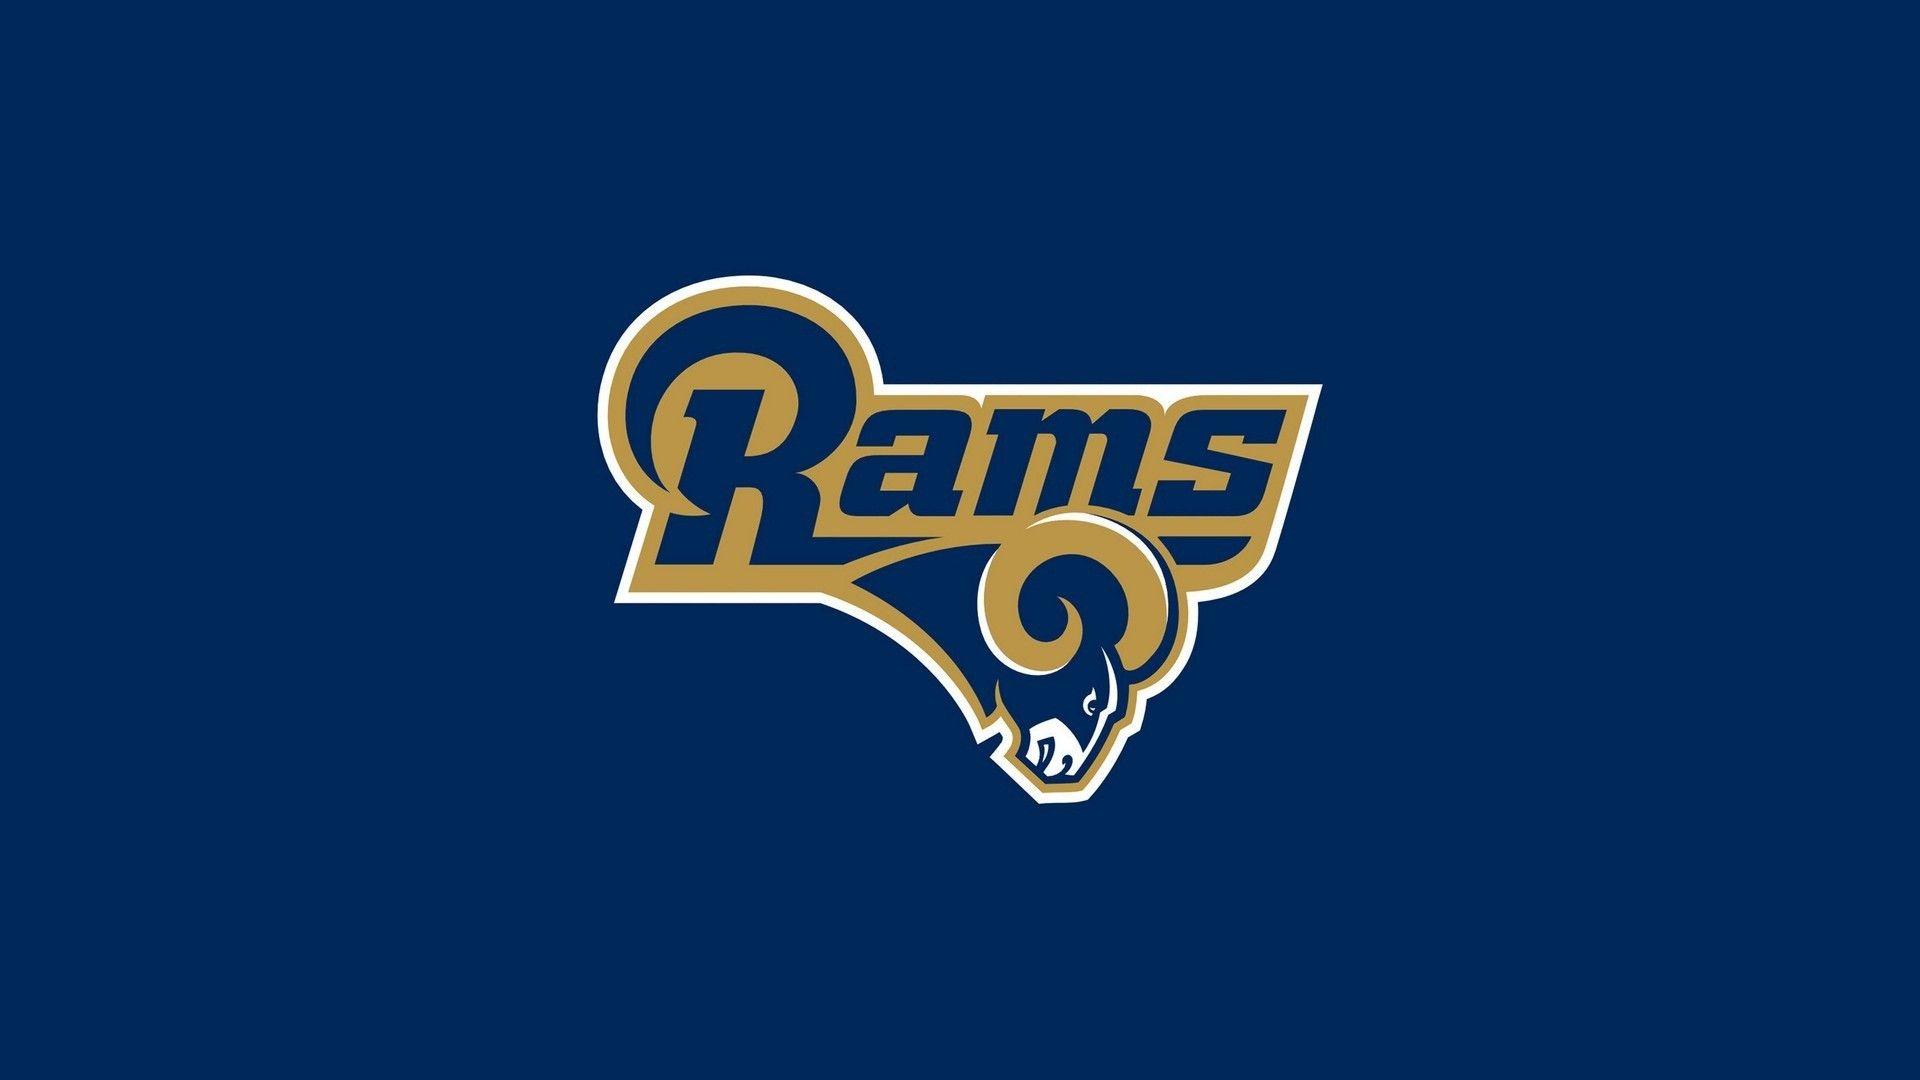 Los Angeles Rams Wallpaper HD 2021 NFL Football Wallpapers Ram 1920x1080